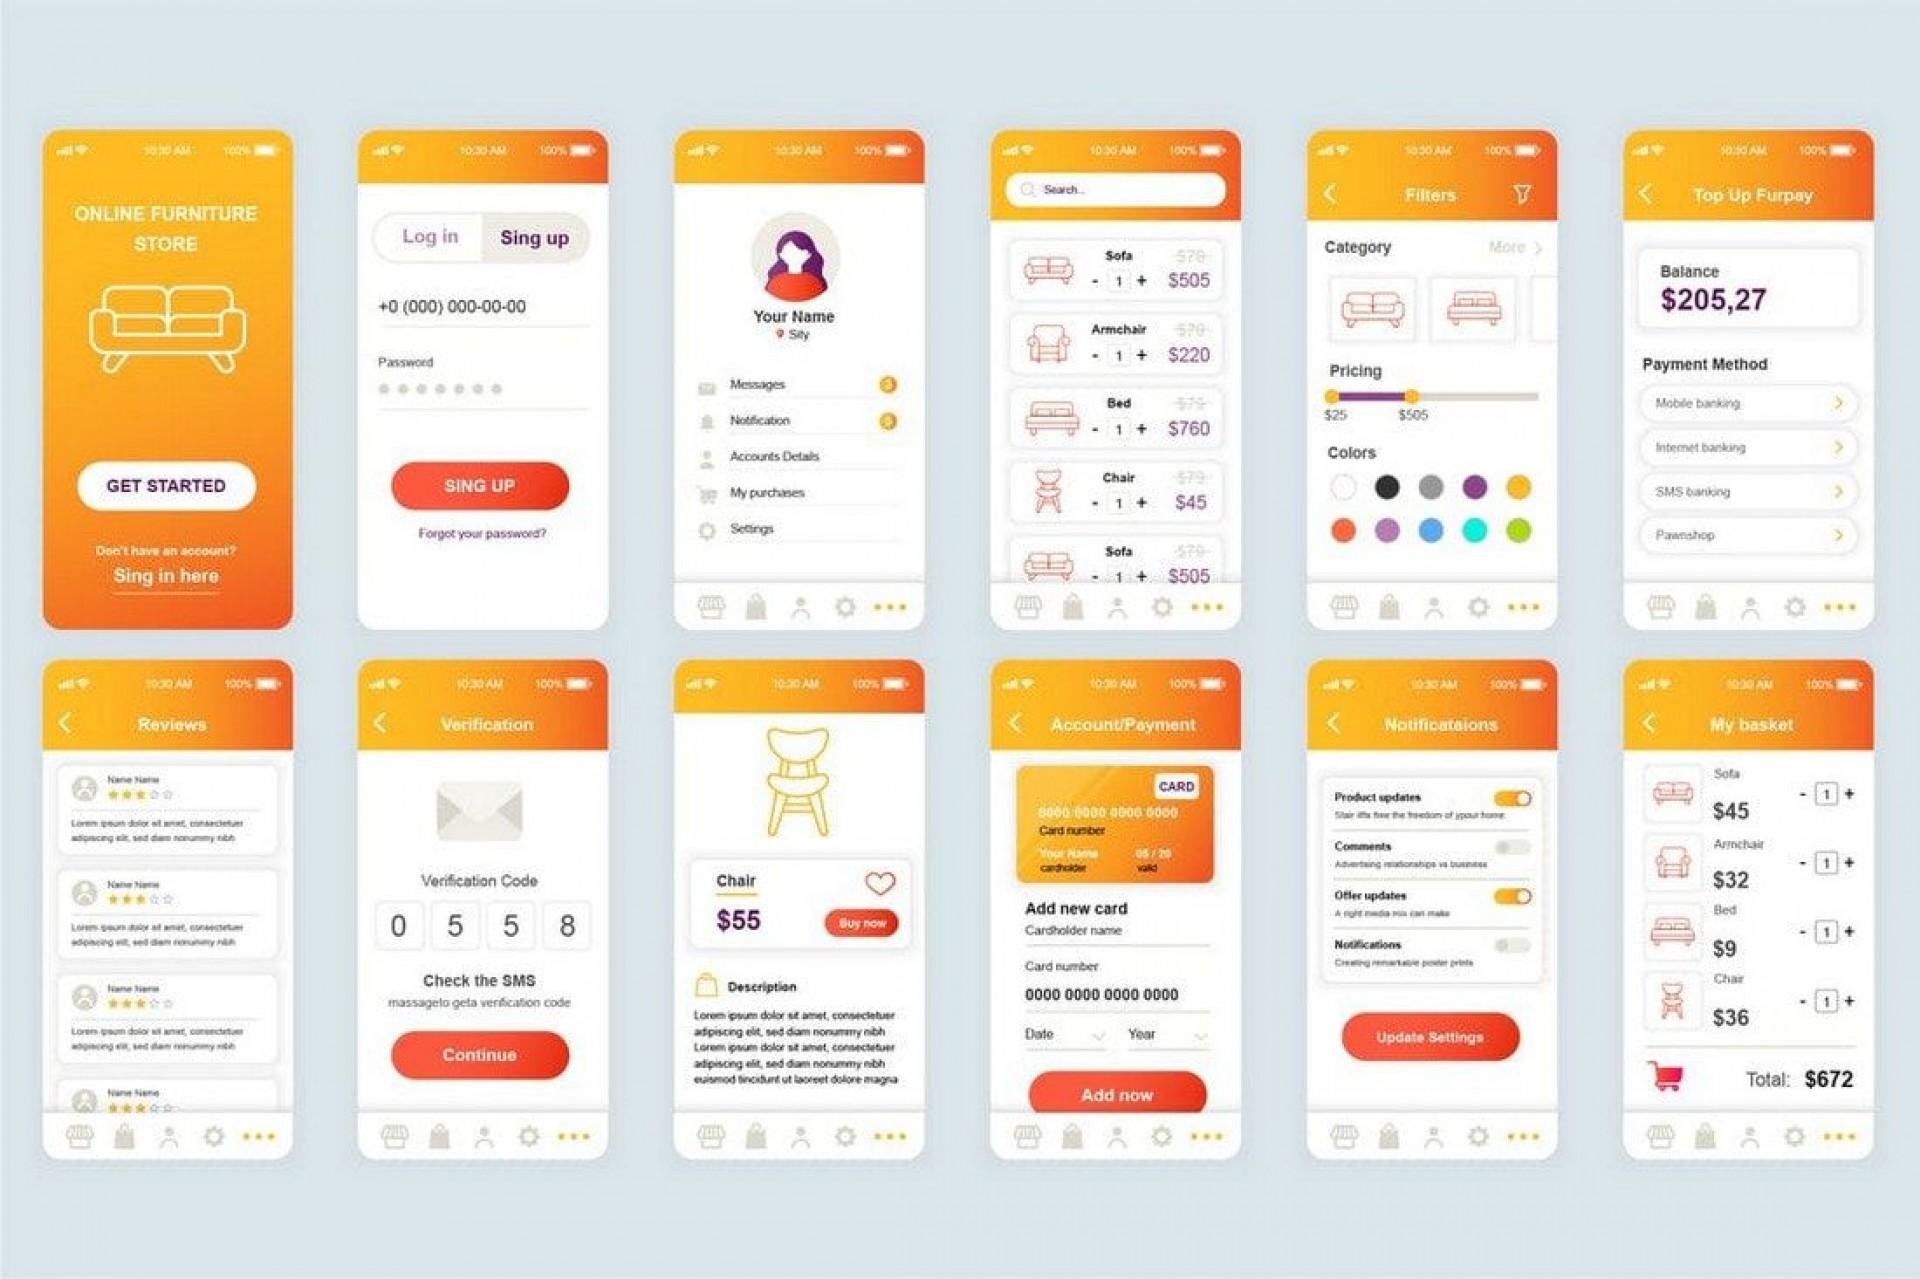 007 Fantastic Mobile App Design Template Image  Size Free Download Ui Psd1920